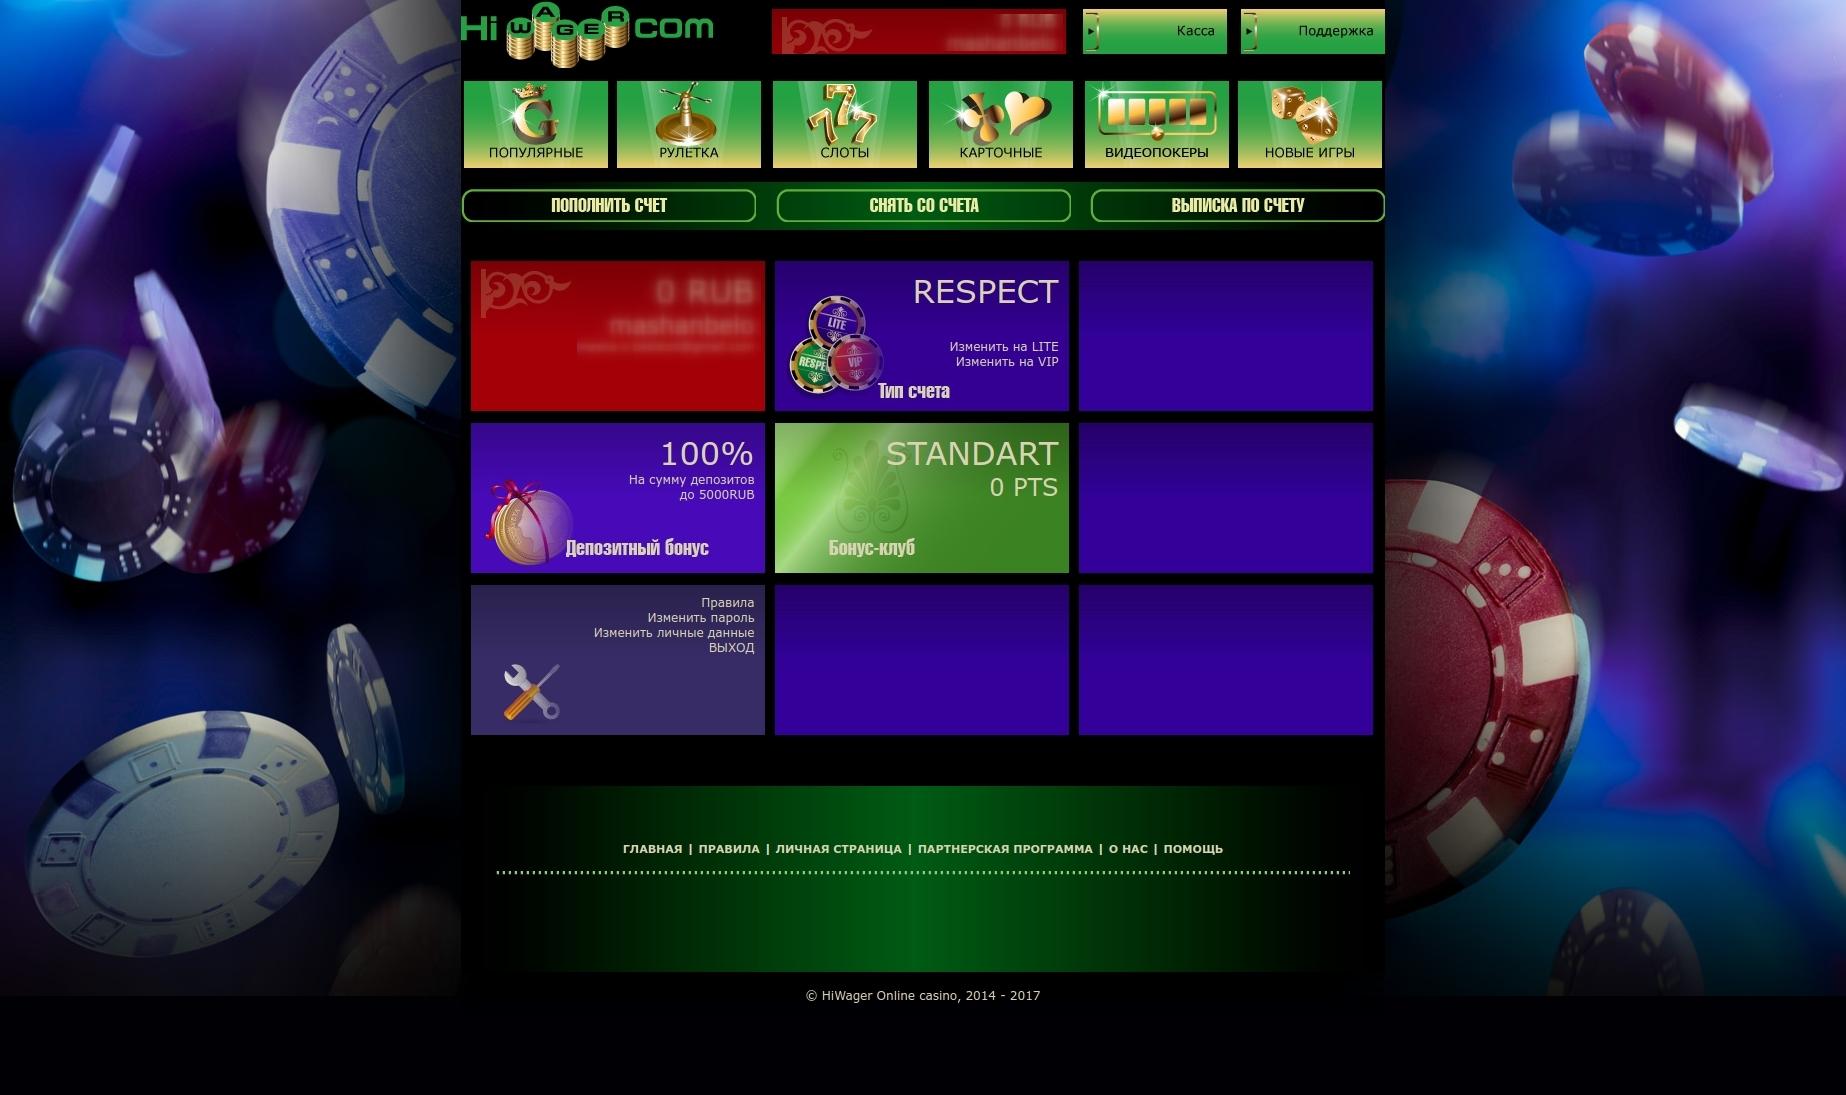 Hiwager online casino бездепозитный бонус даниэль негреану онлайн покер